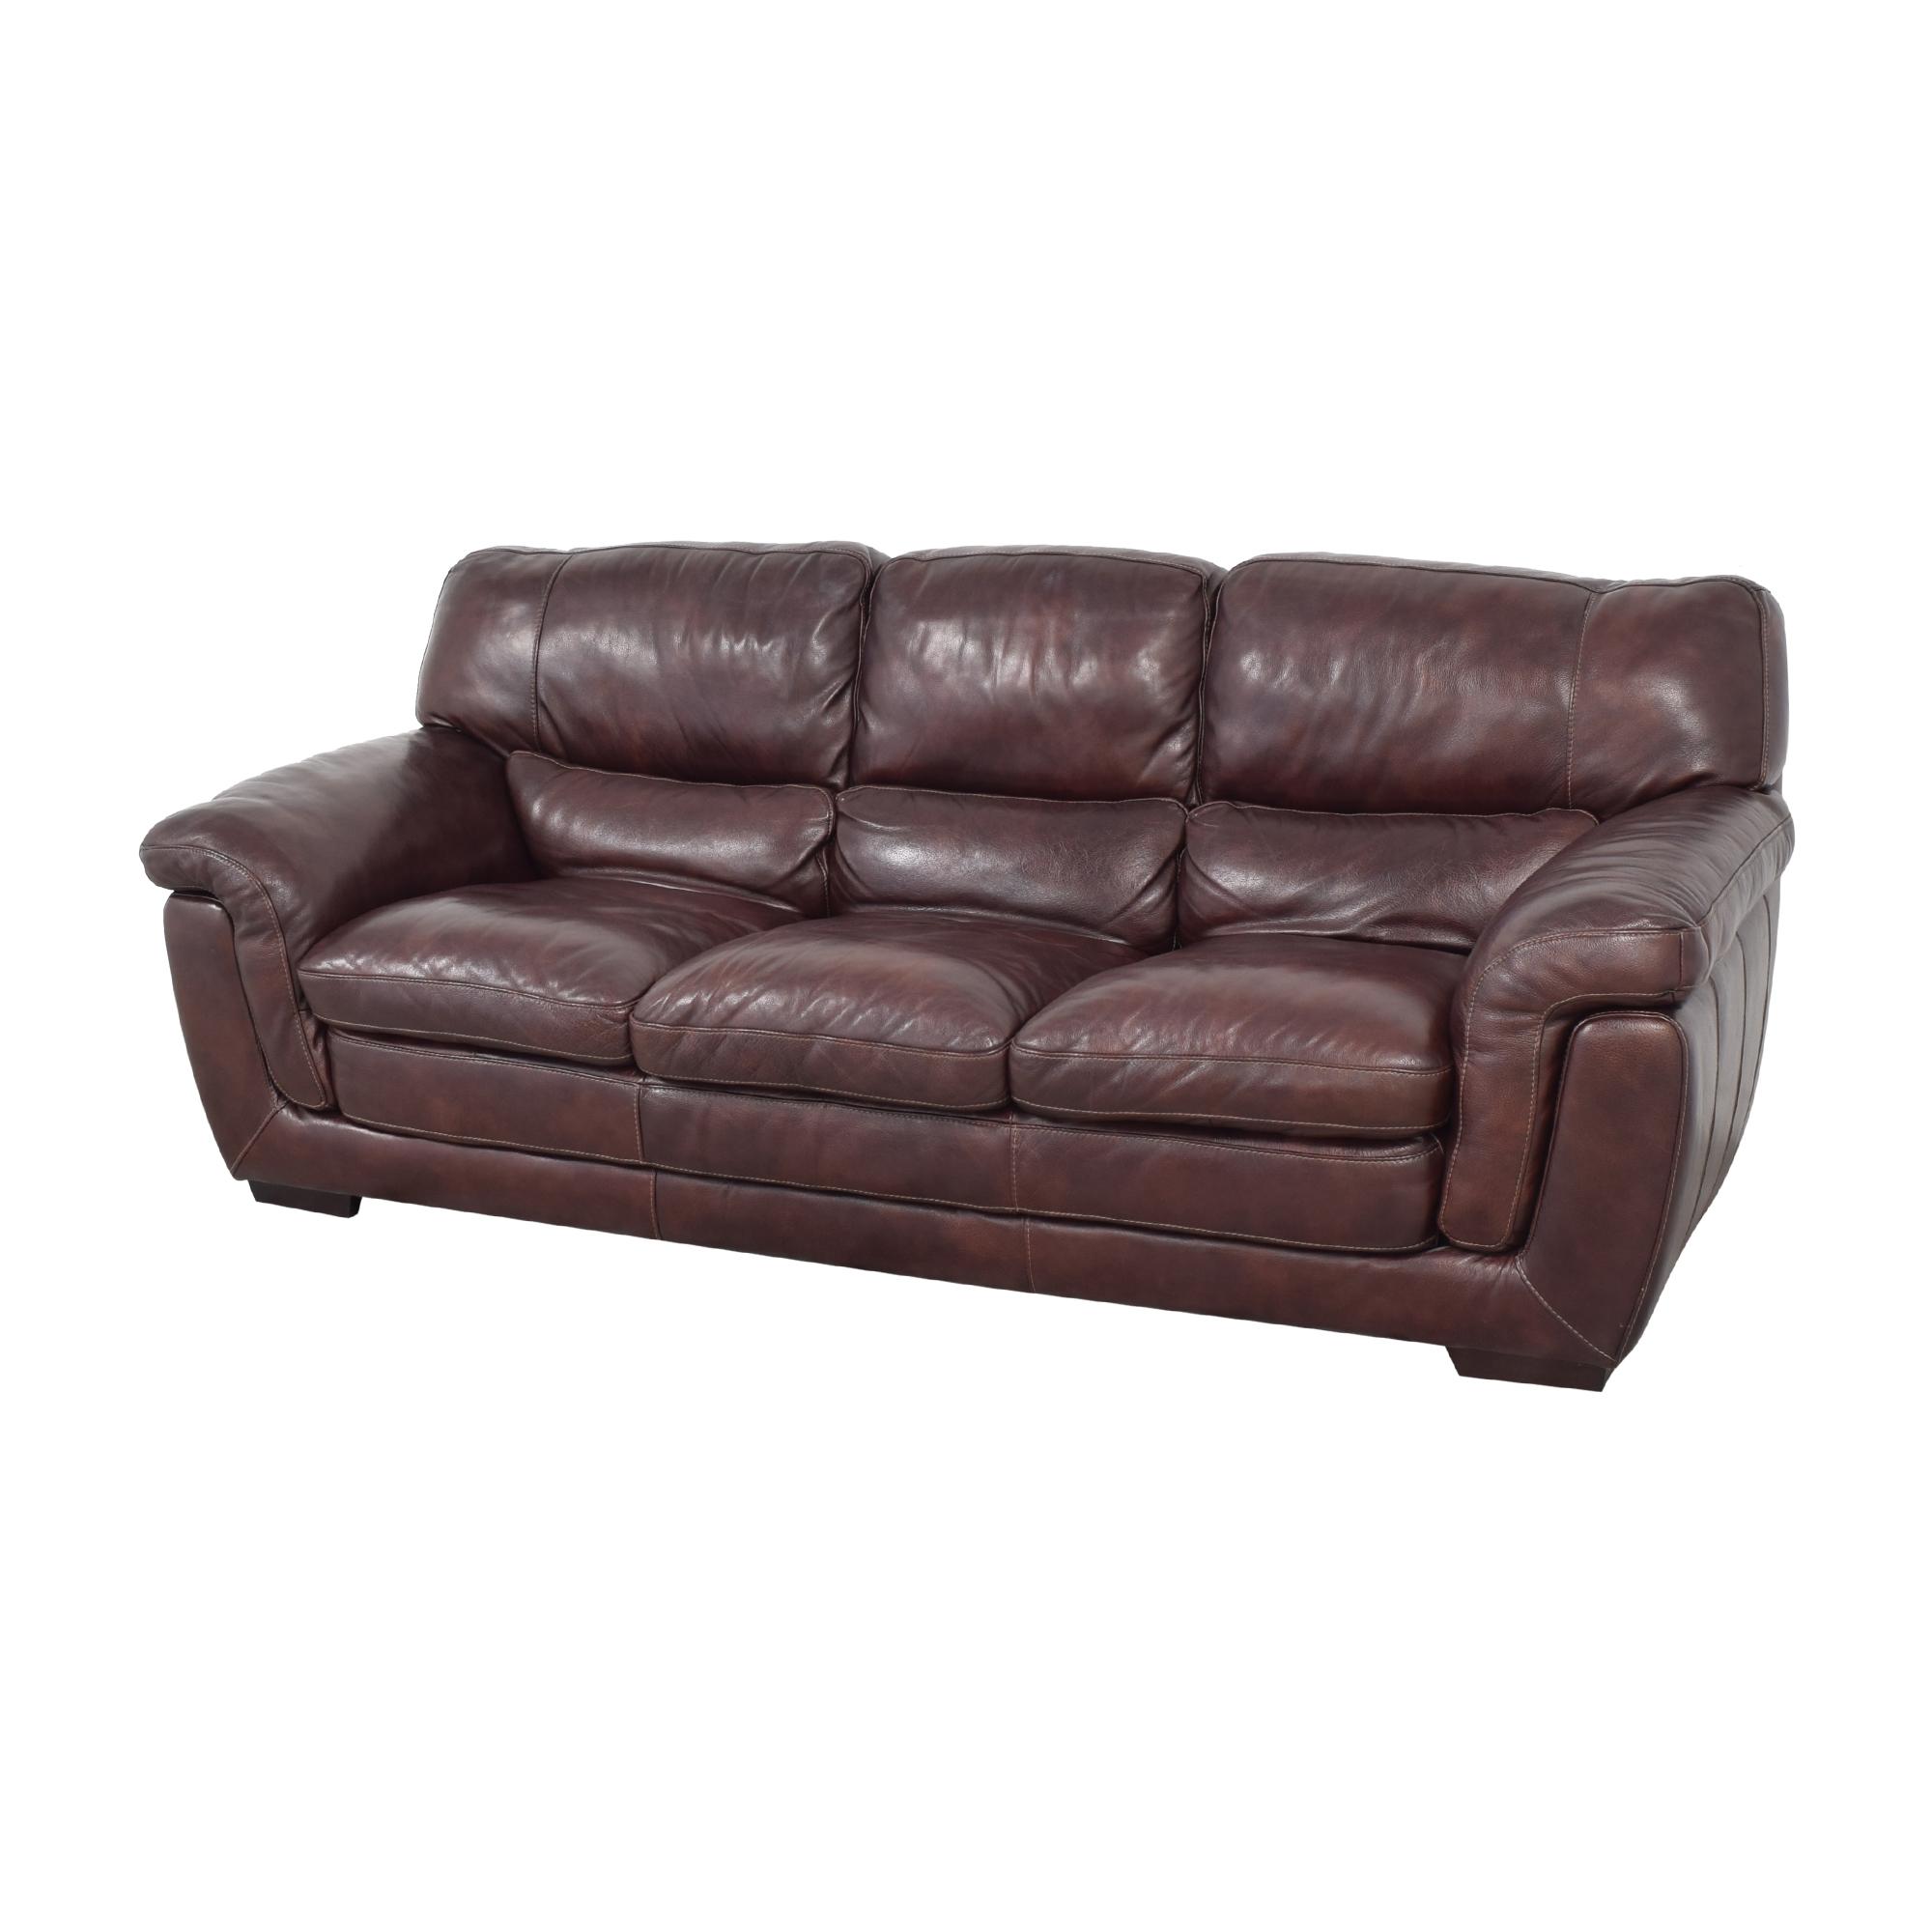 Raymour & Flanigan Raymour & Flanigan Pub-Back Sofa for sale